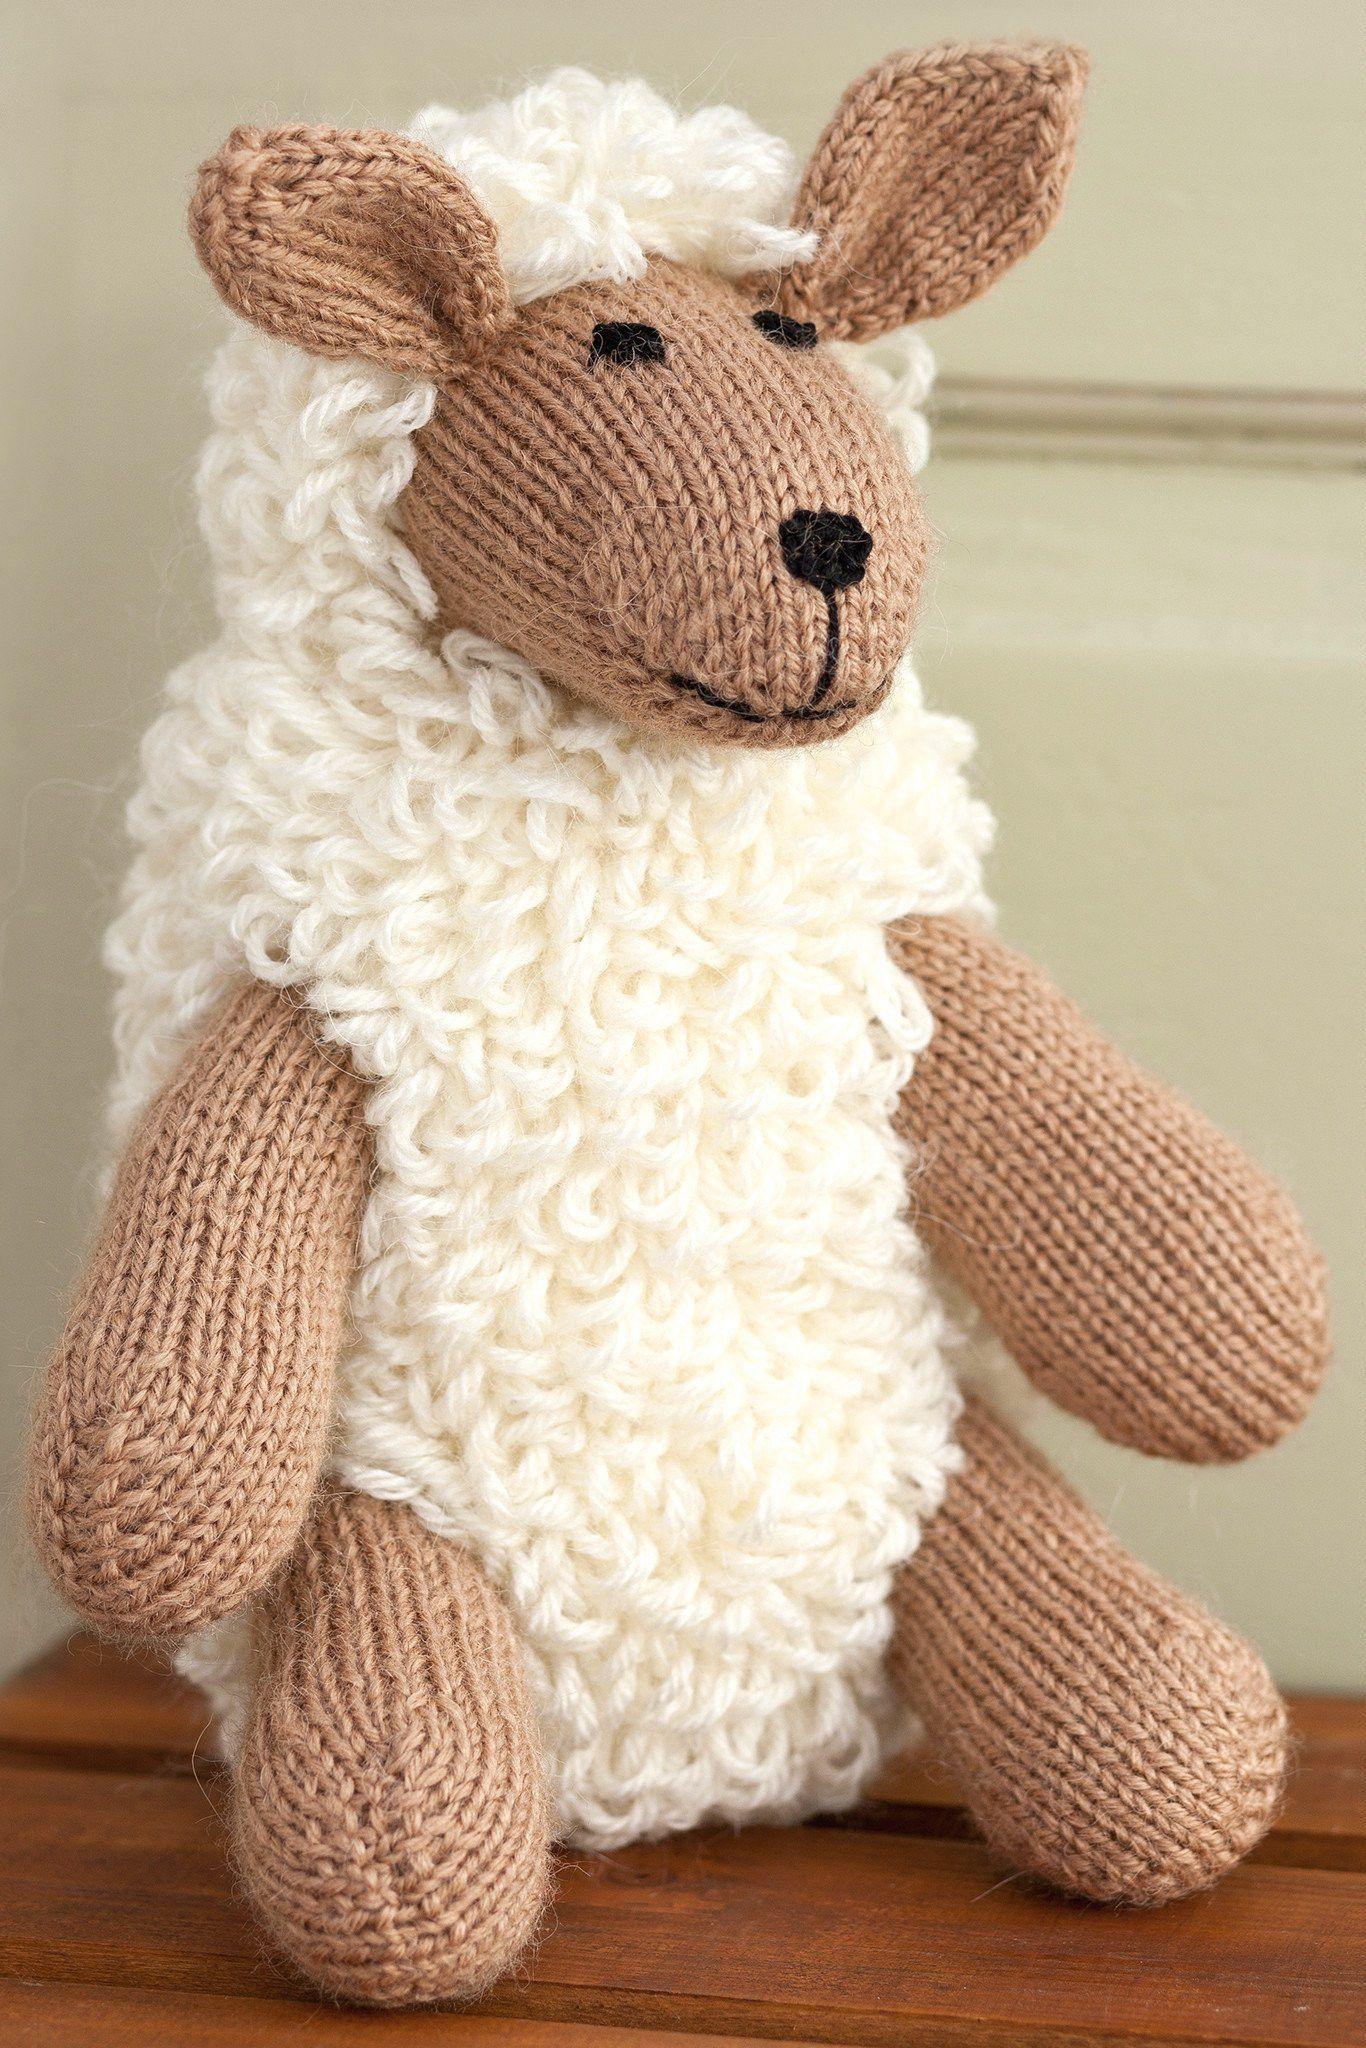 Sheep Toy Knitting Pattern   The Knitting Network